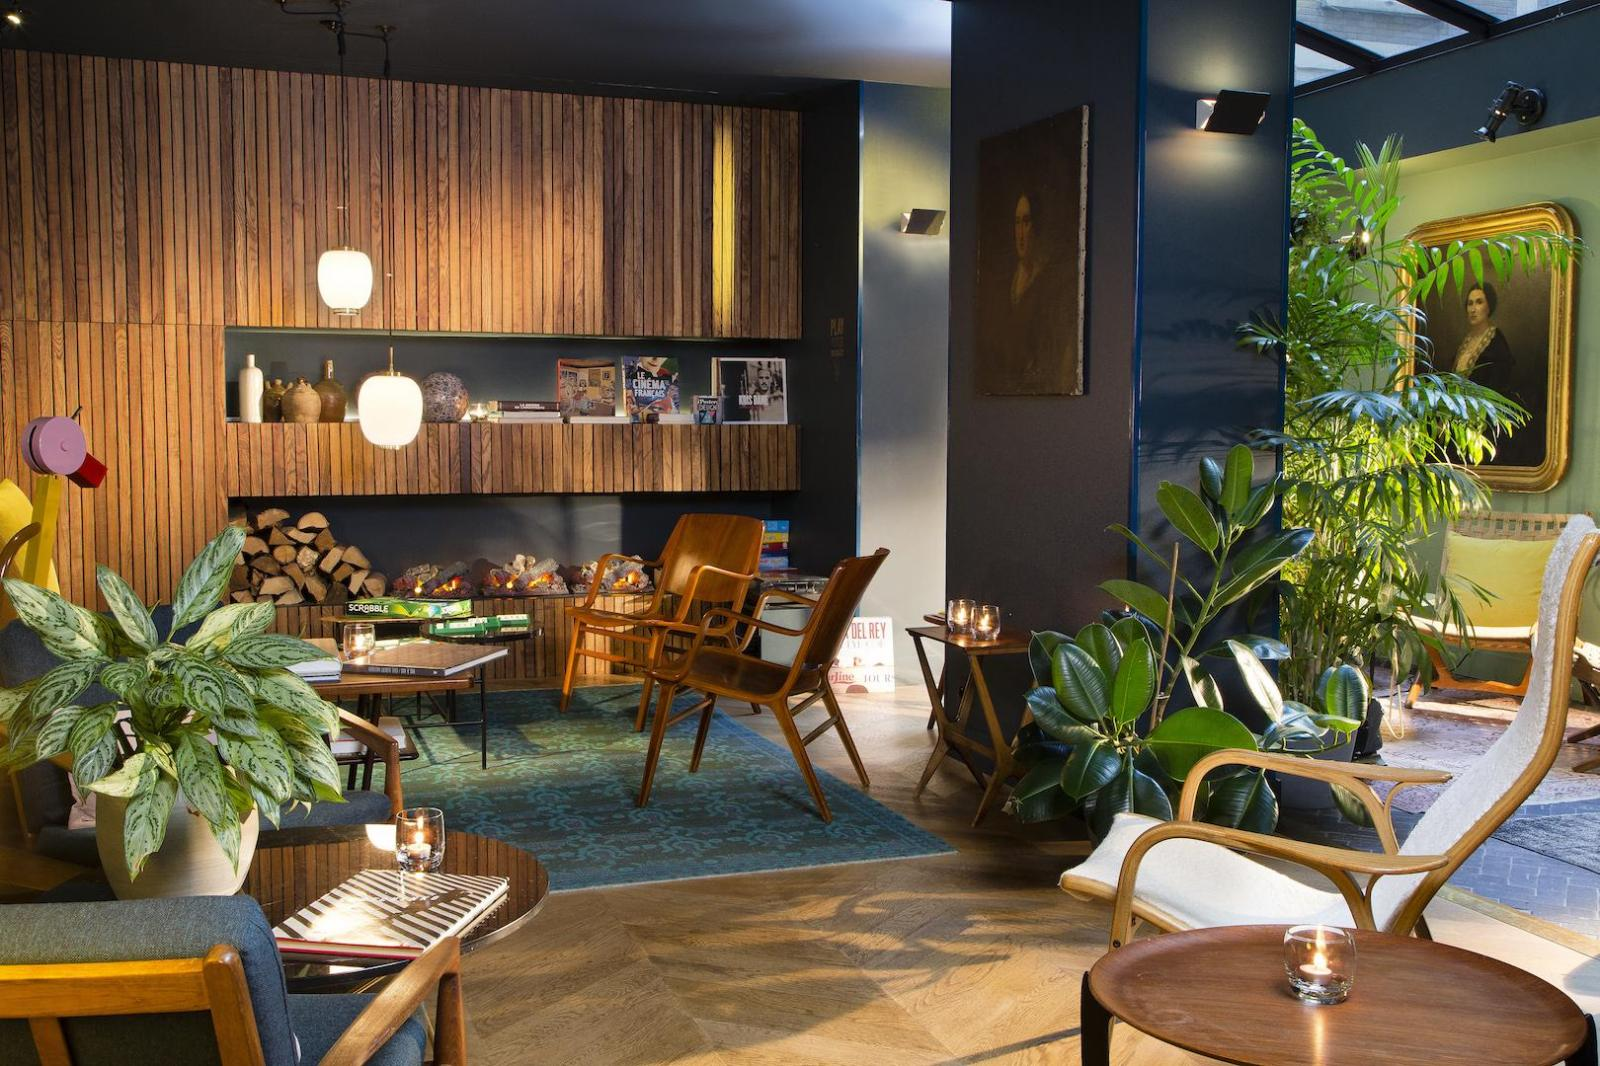 coq-hotel-galerie-photos-106330-1600-900-auto.jpeg